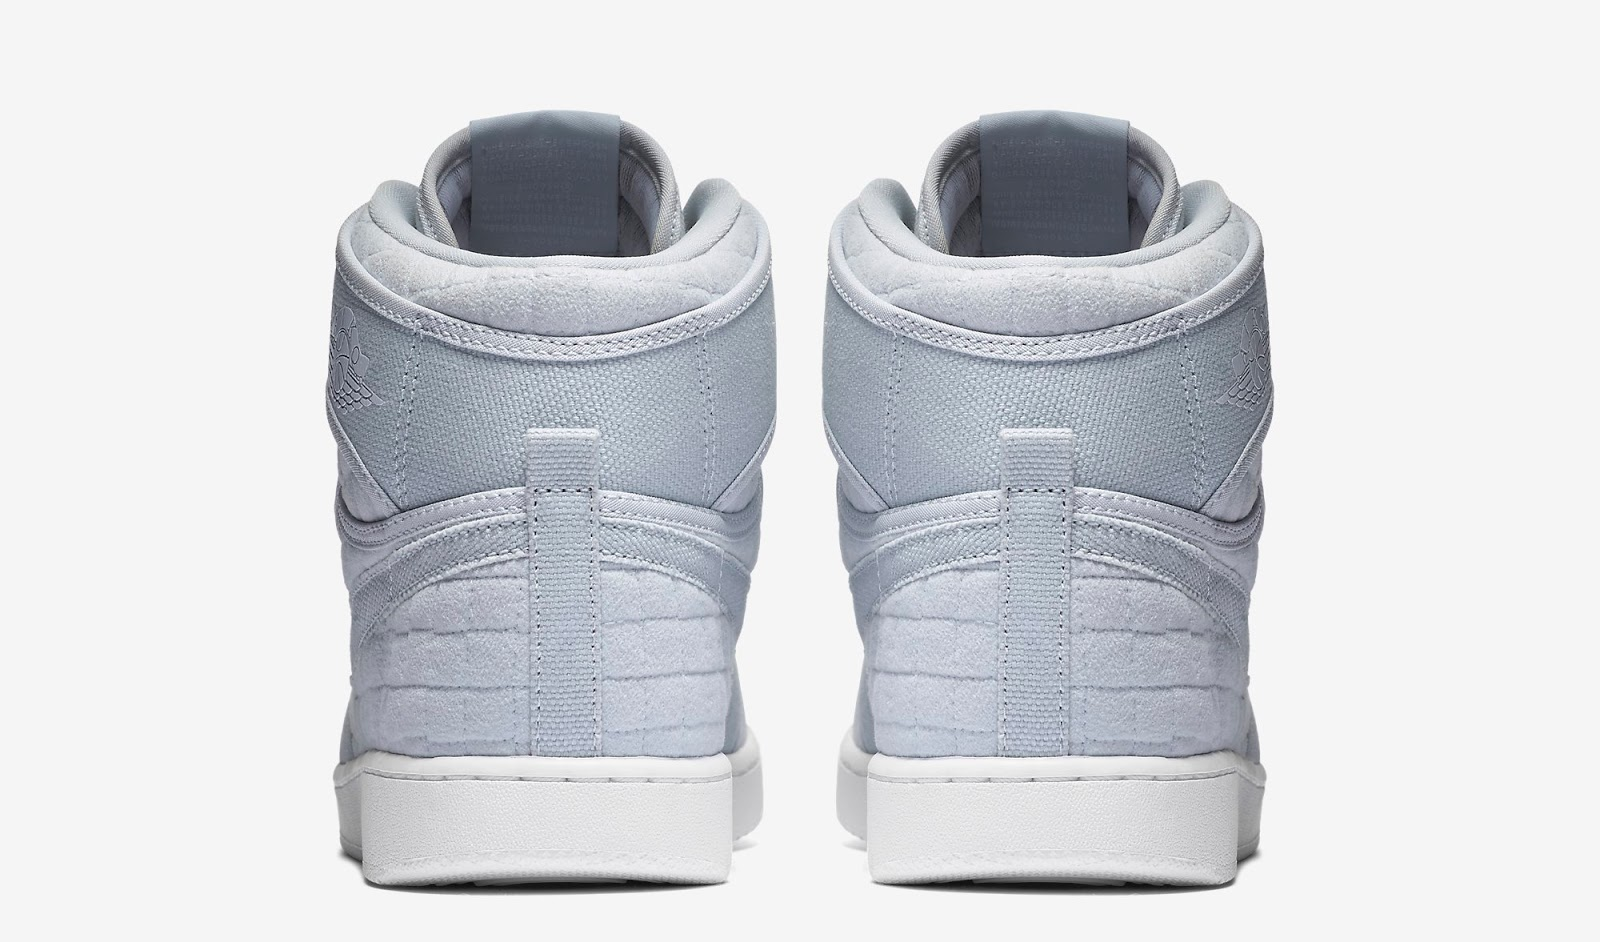 sports shoes 6e9e4 74d70 ajordanxi Your  1 Source For Sneaker Release Dates  Air Jordan 1 ...